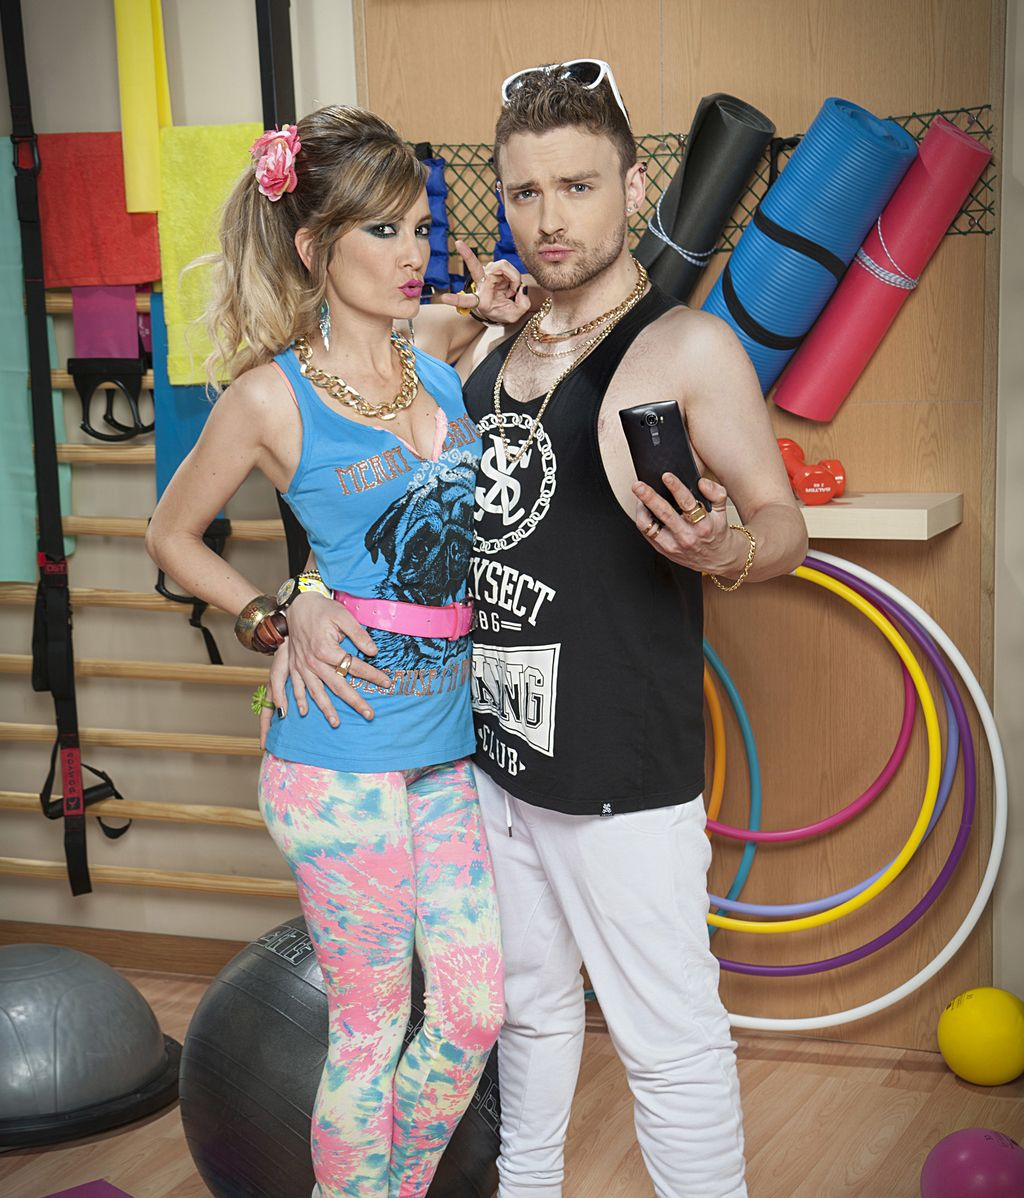 Miriam Cabeza (Vanessa) y Adam Jezierski (Christian), en 'Gym Tony L.C.'